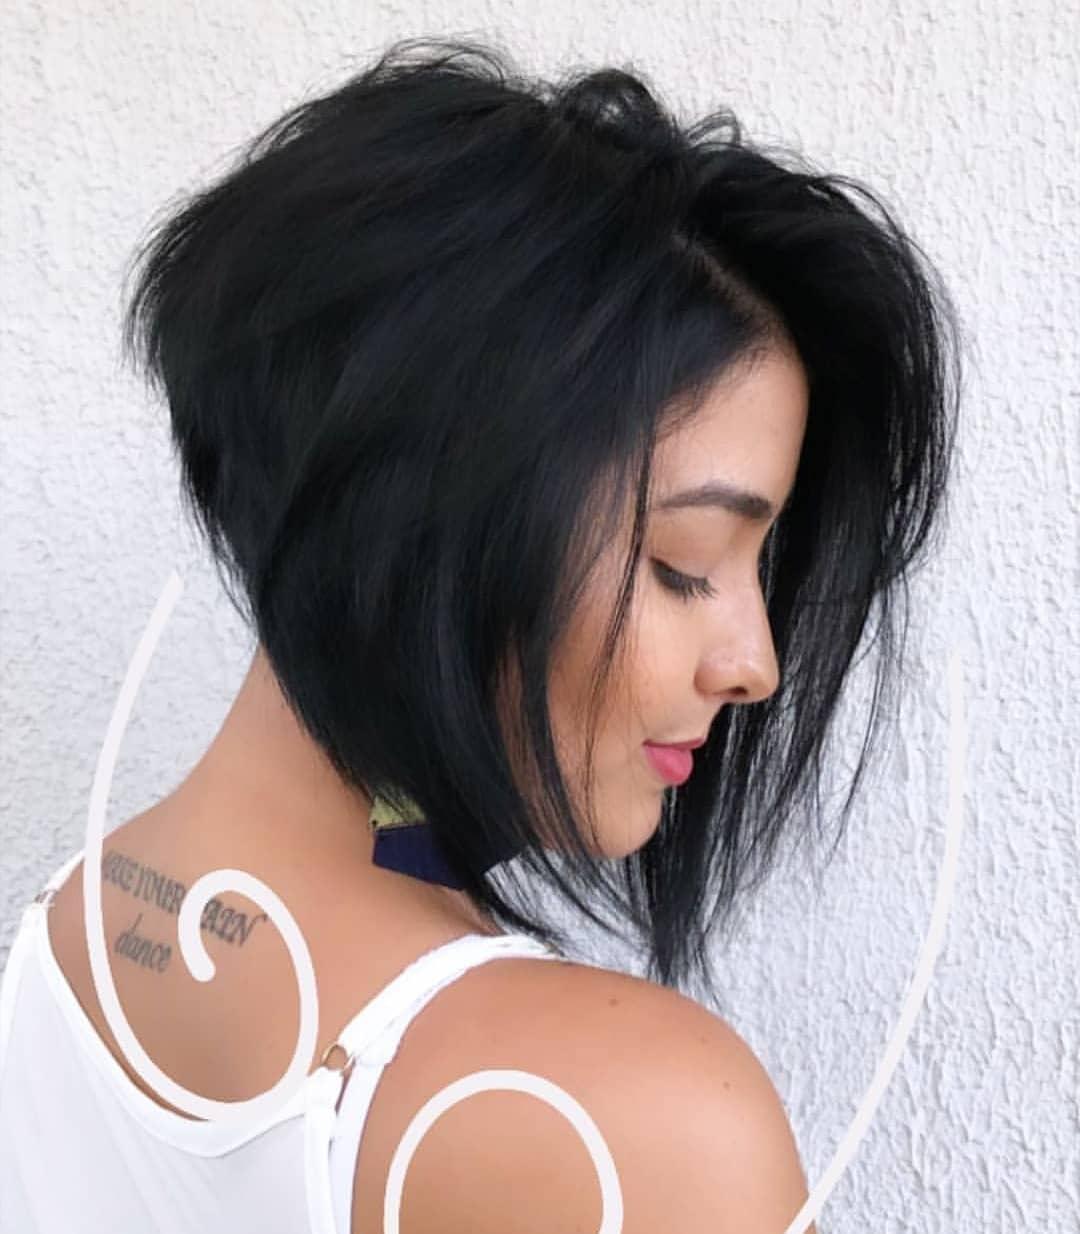 укладка затылка на коротких волосах фото 11